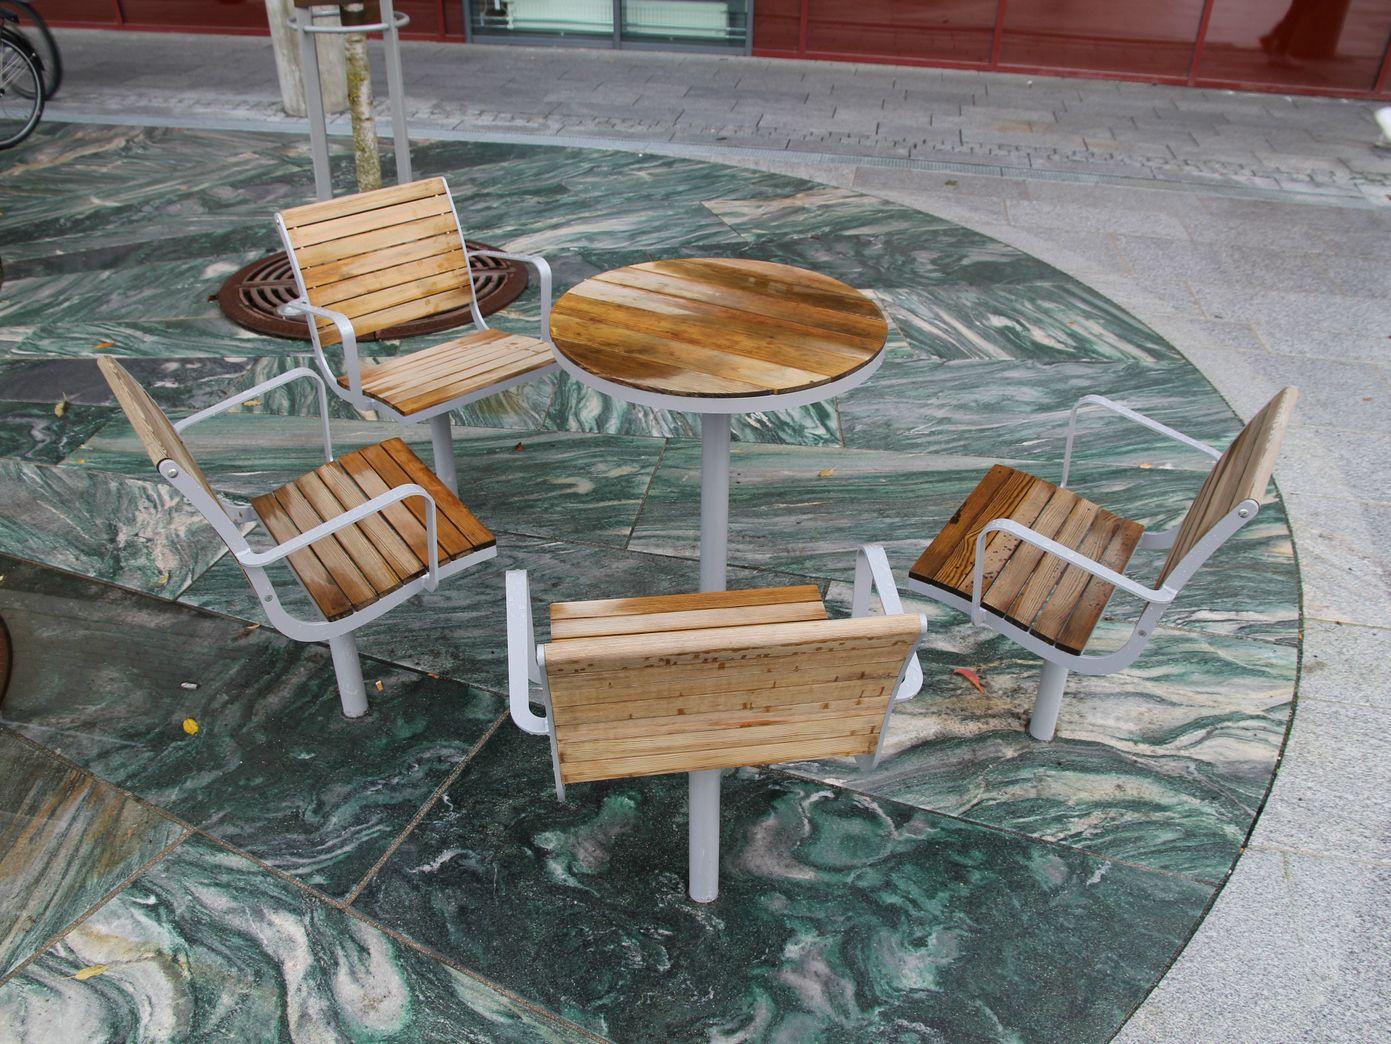 parco chaise d 39 ext rieur en acier et bois by nola industrier design brda broberg ridderstr le. Black Bedroom Furniture Sets. Home Design Ideas